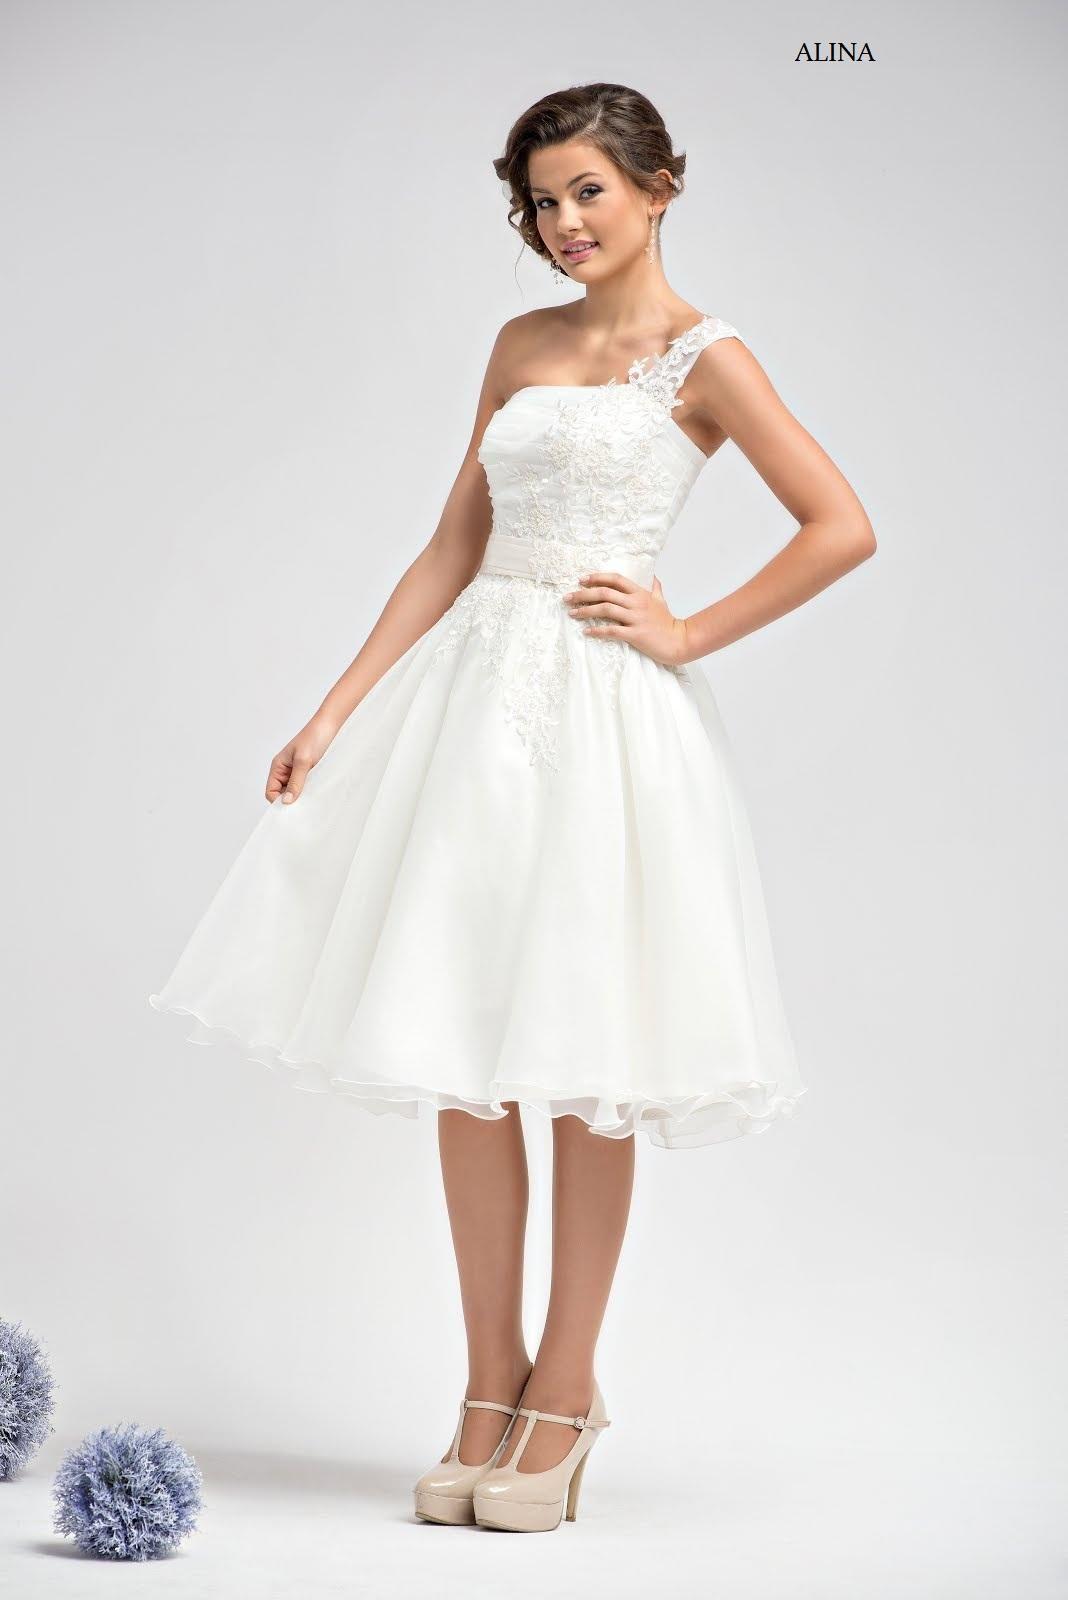 Brautkleid Alina | Brautkleider | Pinterest | Wedding dress and Weddings